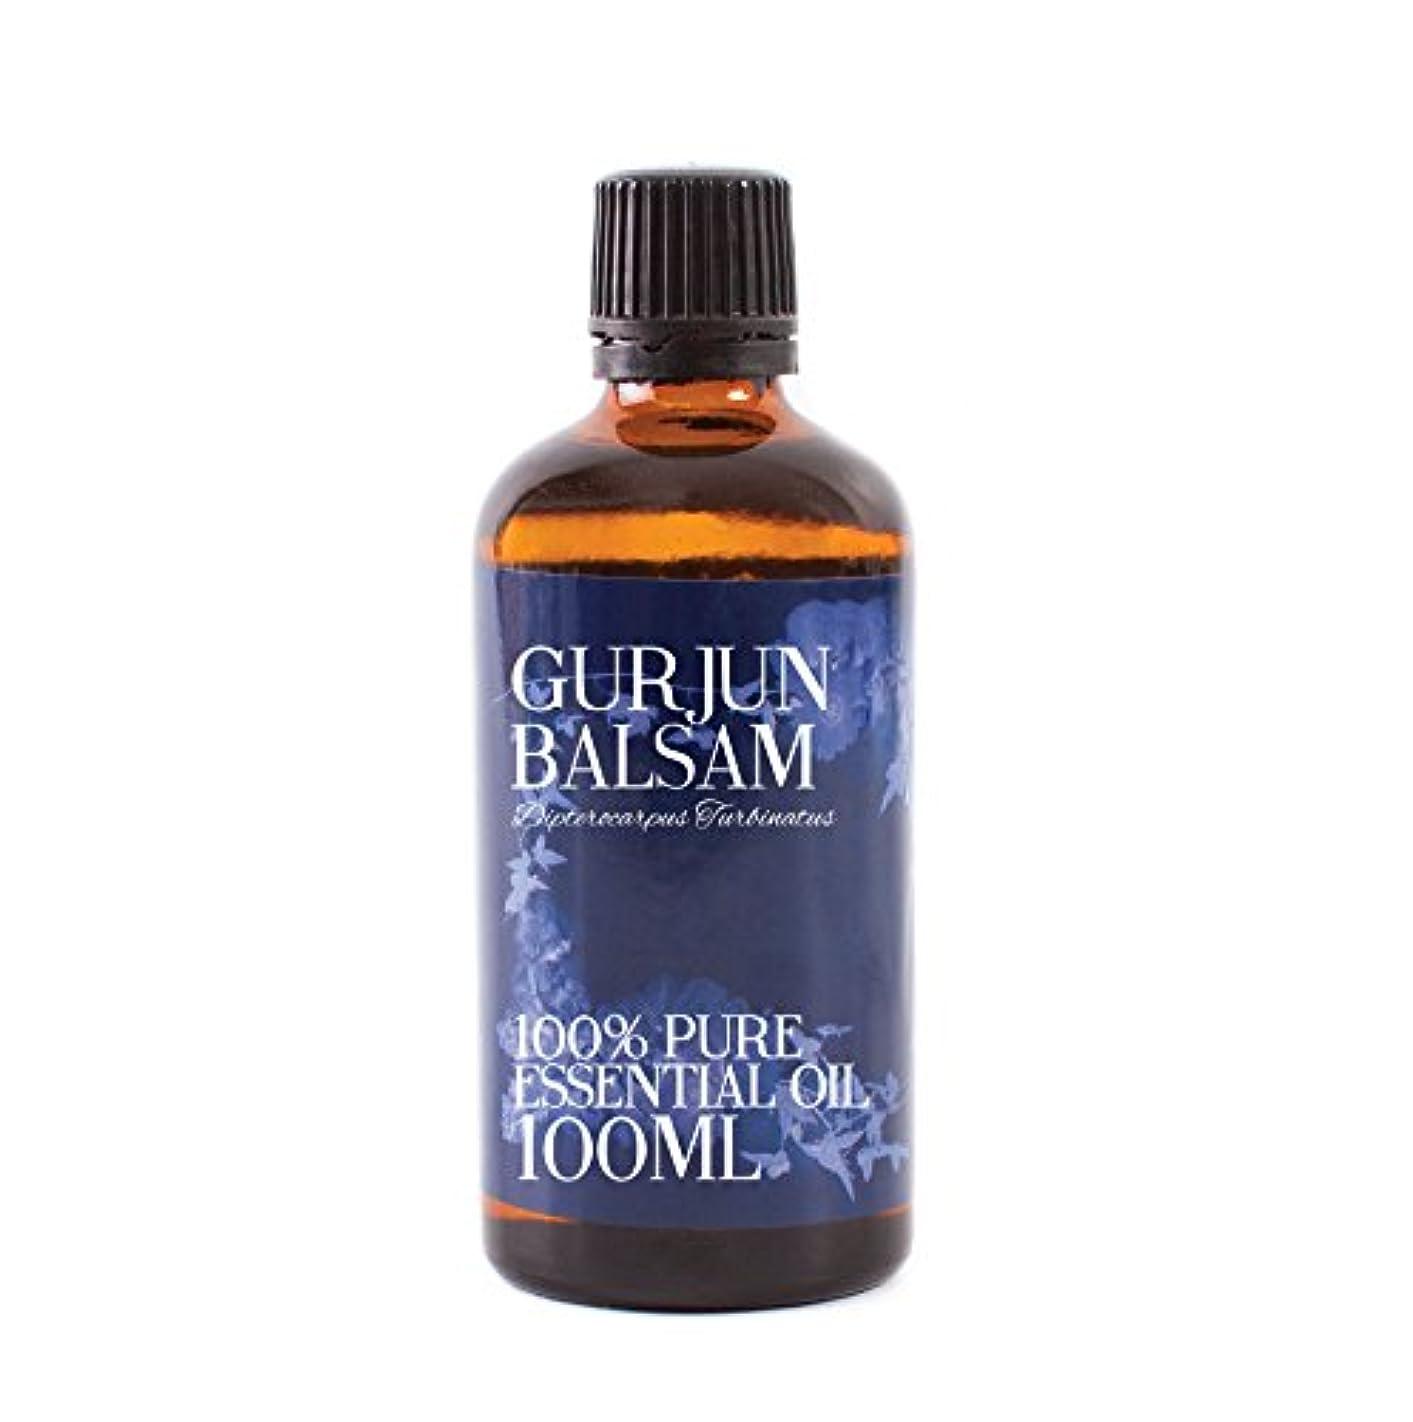 Mystic Moments | Gurjun Balsam Essential Oil - 100ml - 100% Pure